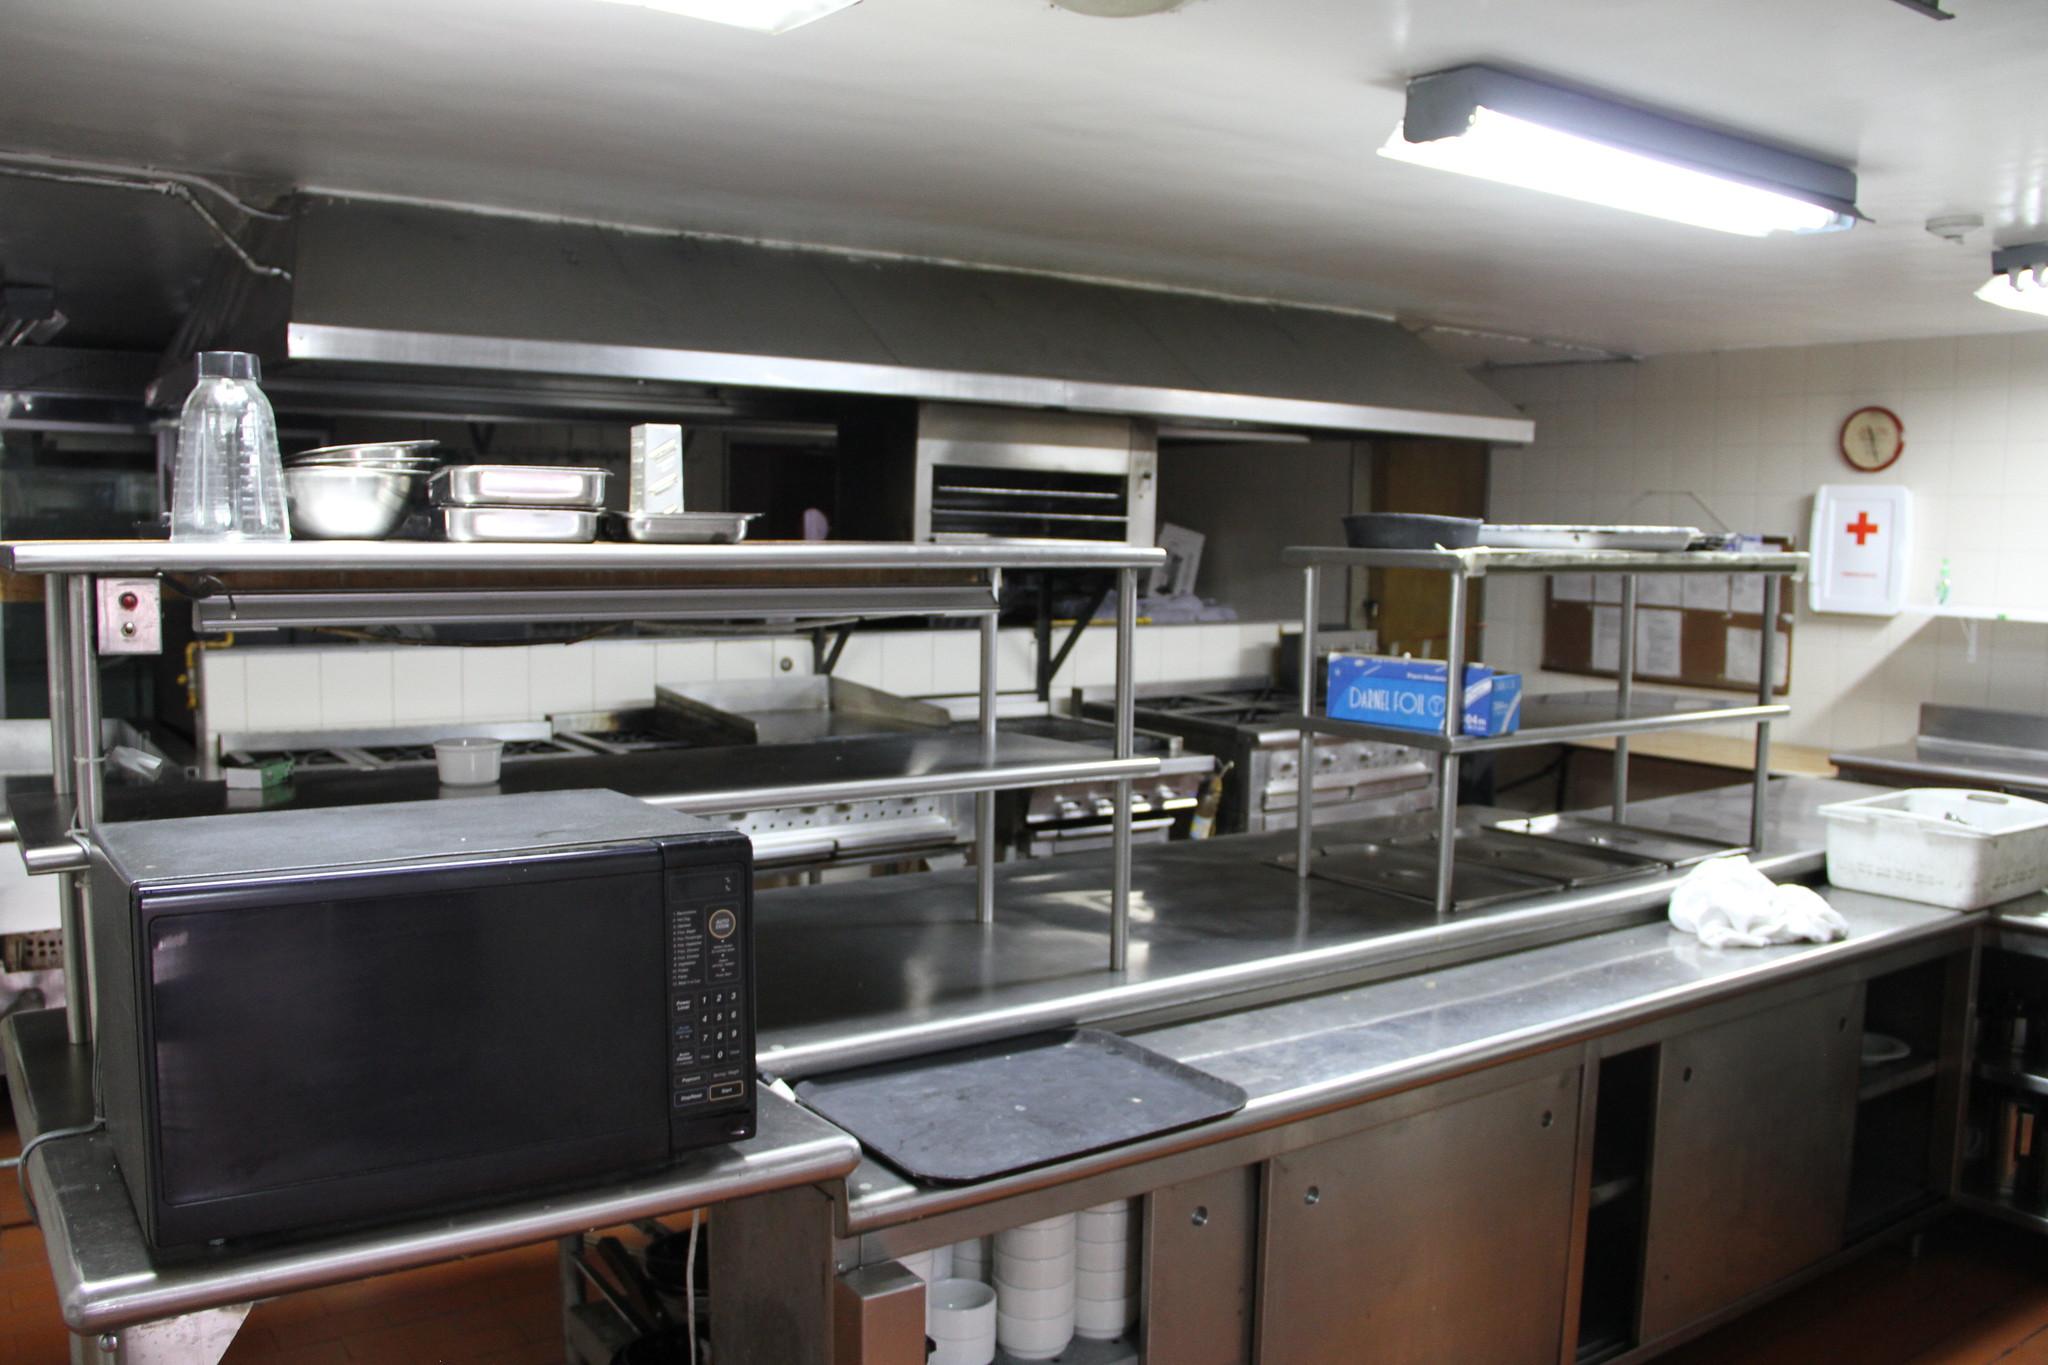 Cocina profesional para banquetes flickr photo sharing for Cocina profesional